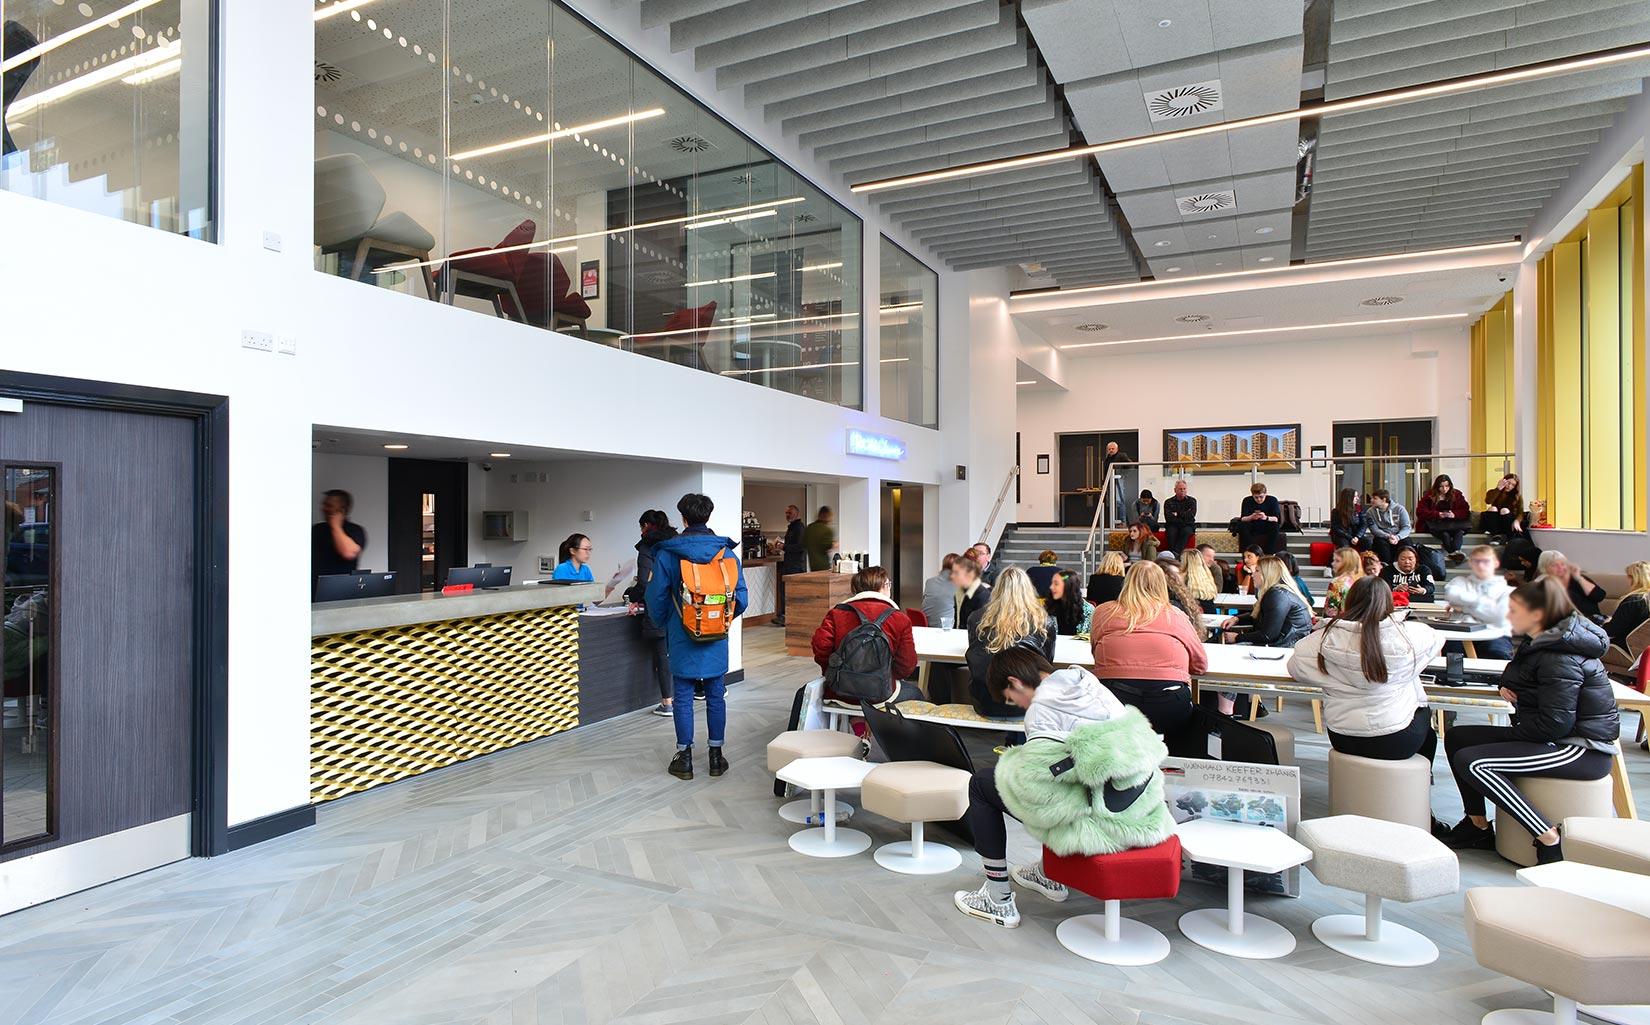 Leeds Arts University, Café